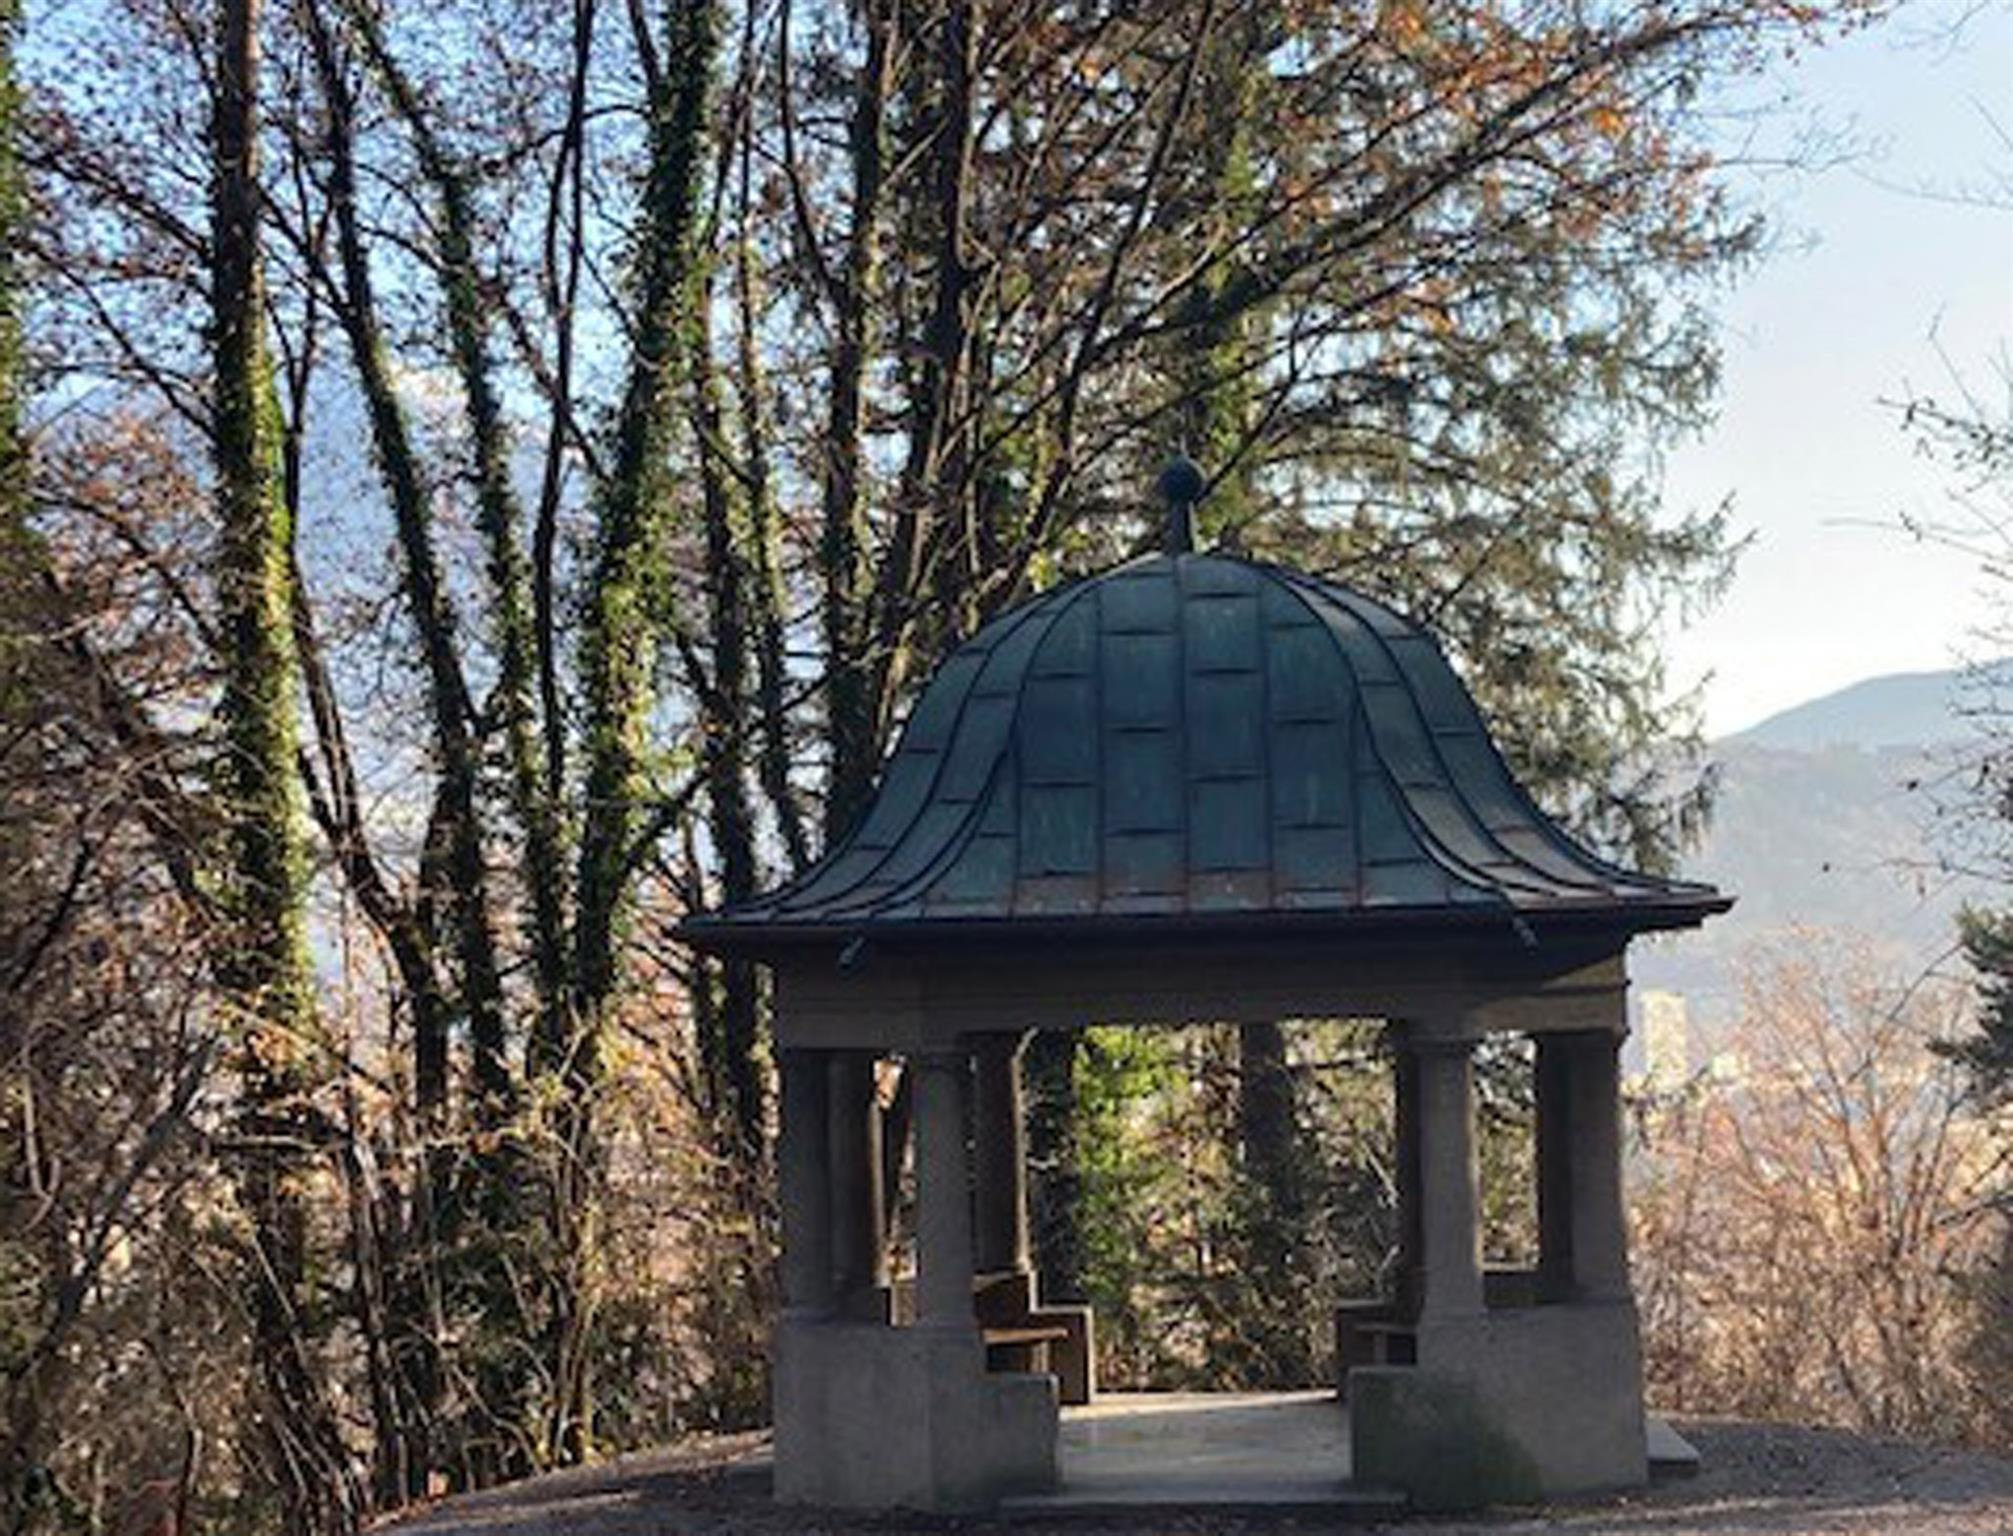 Pavillon nähe Alpenzoo